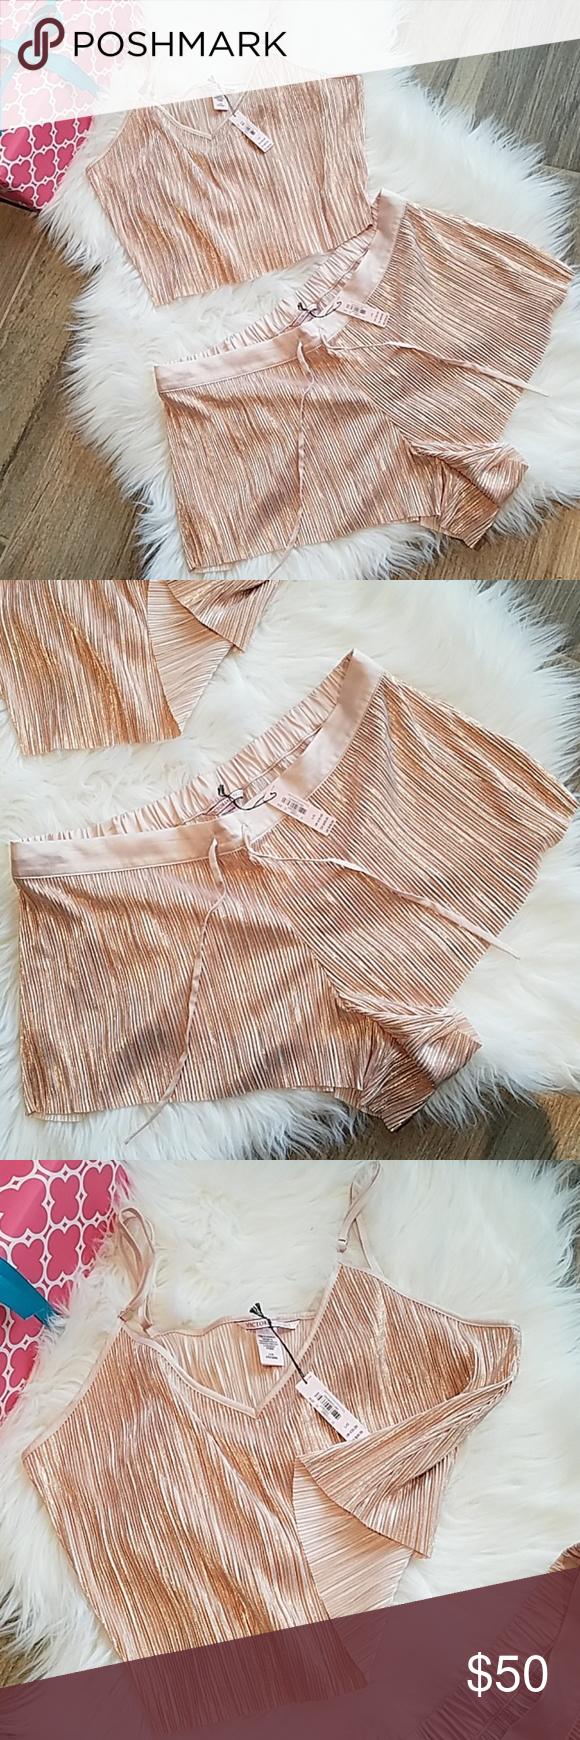 104175f821 Victoria s Secret Shine Pleat Crop Cami  amp  Shorts Victoria s Secret  Shine Pleat Crop Cami  amp